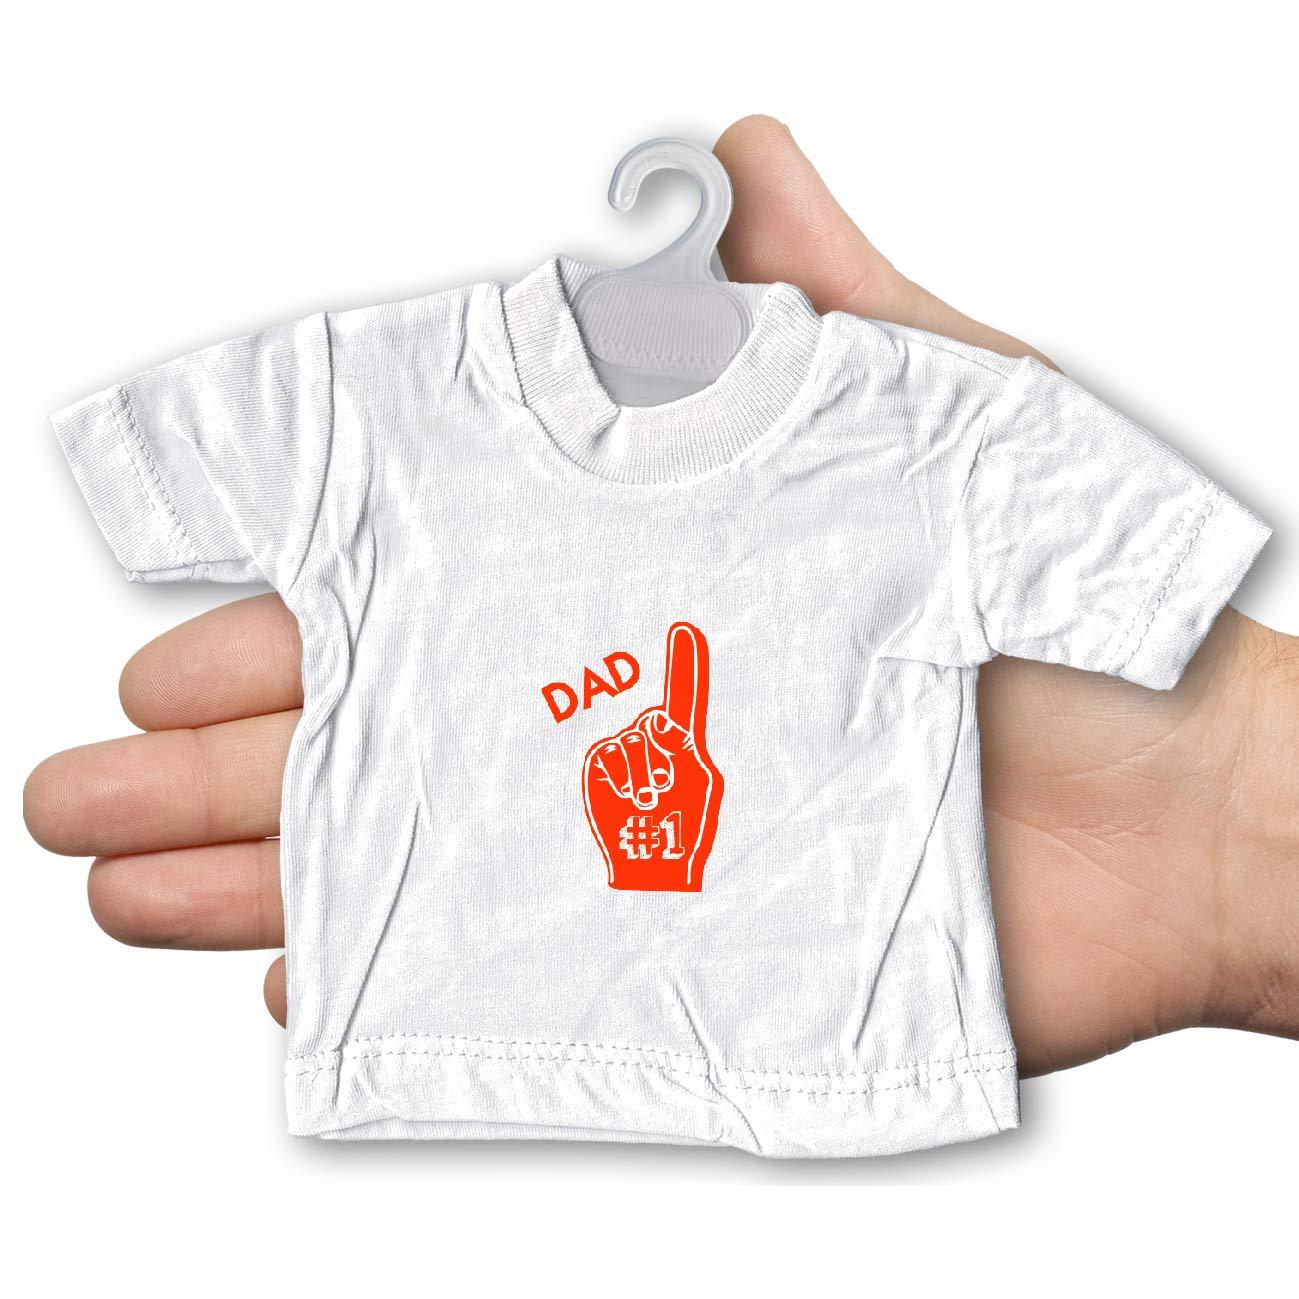 My Custom Style Mini T-Shirt per Auto #Festa del pap/à HappyFather3# Bianca